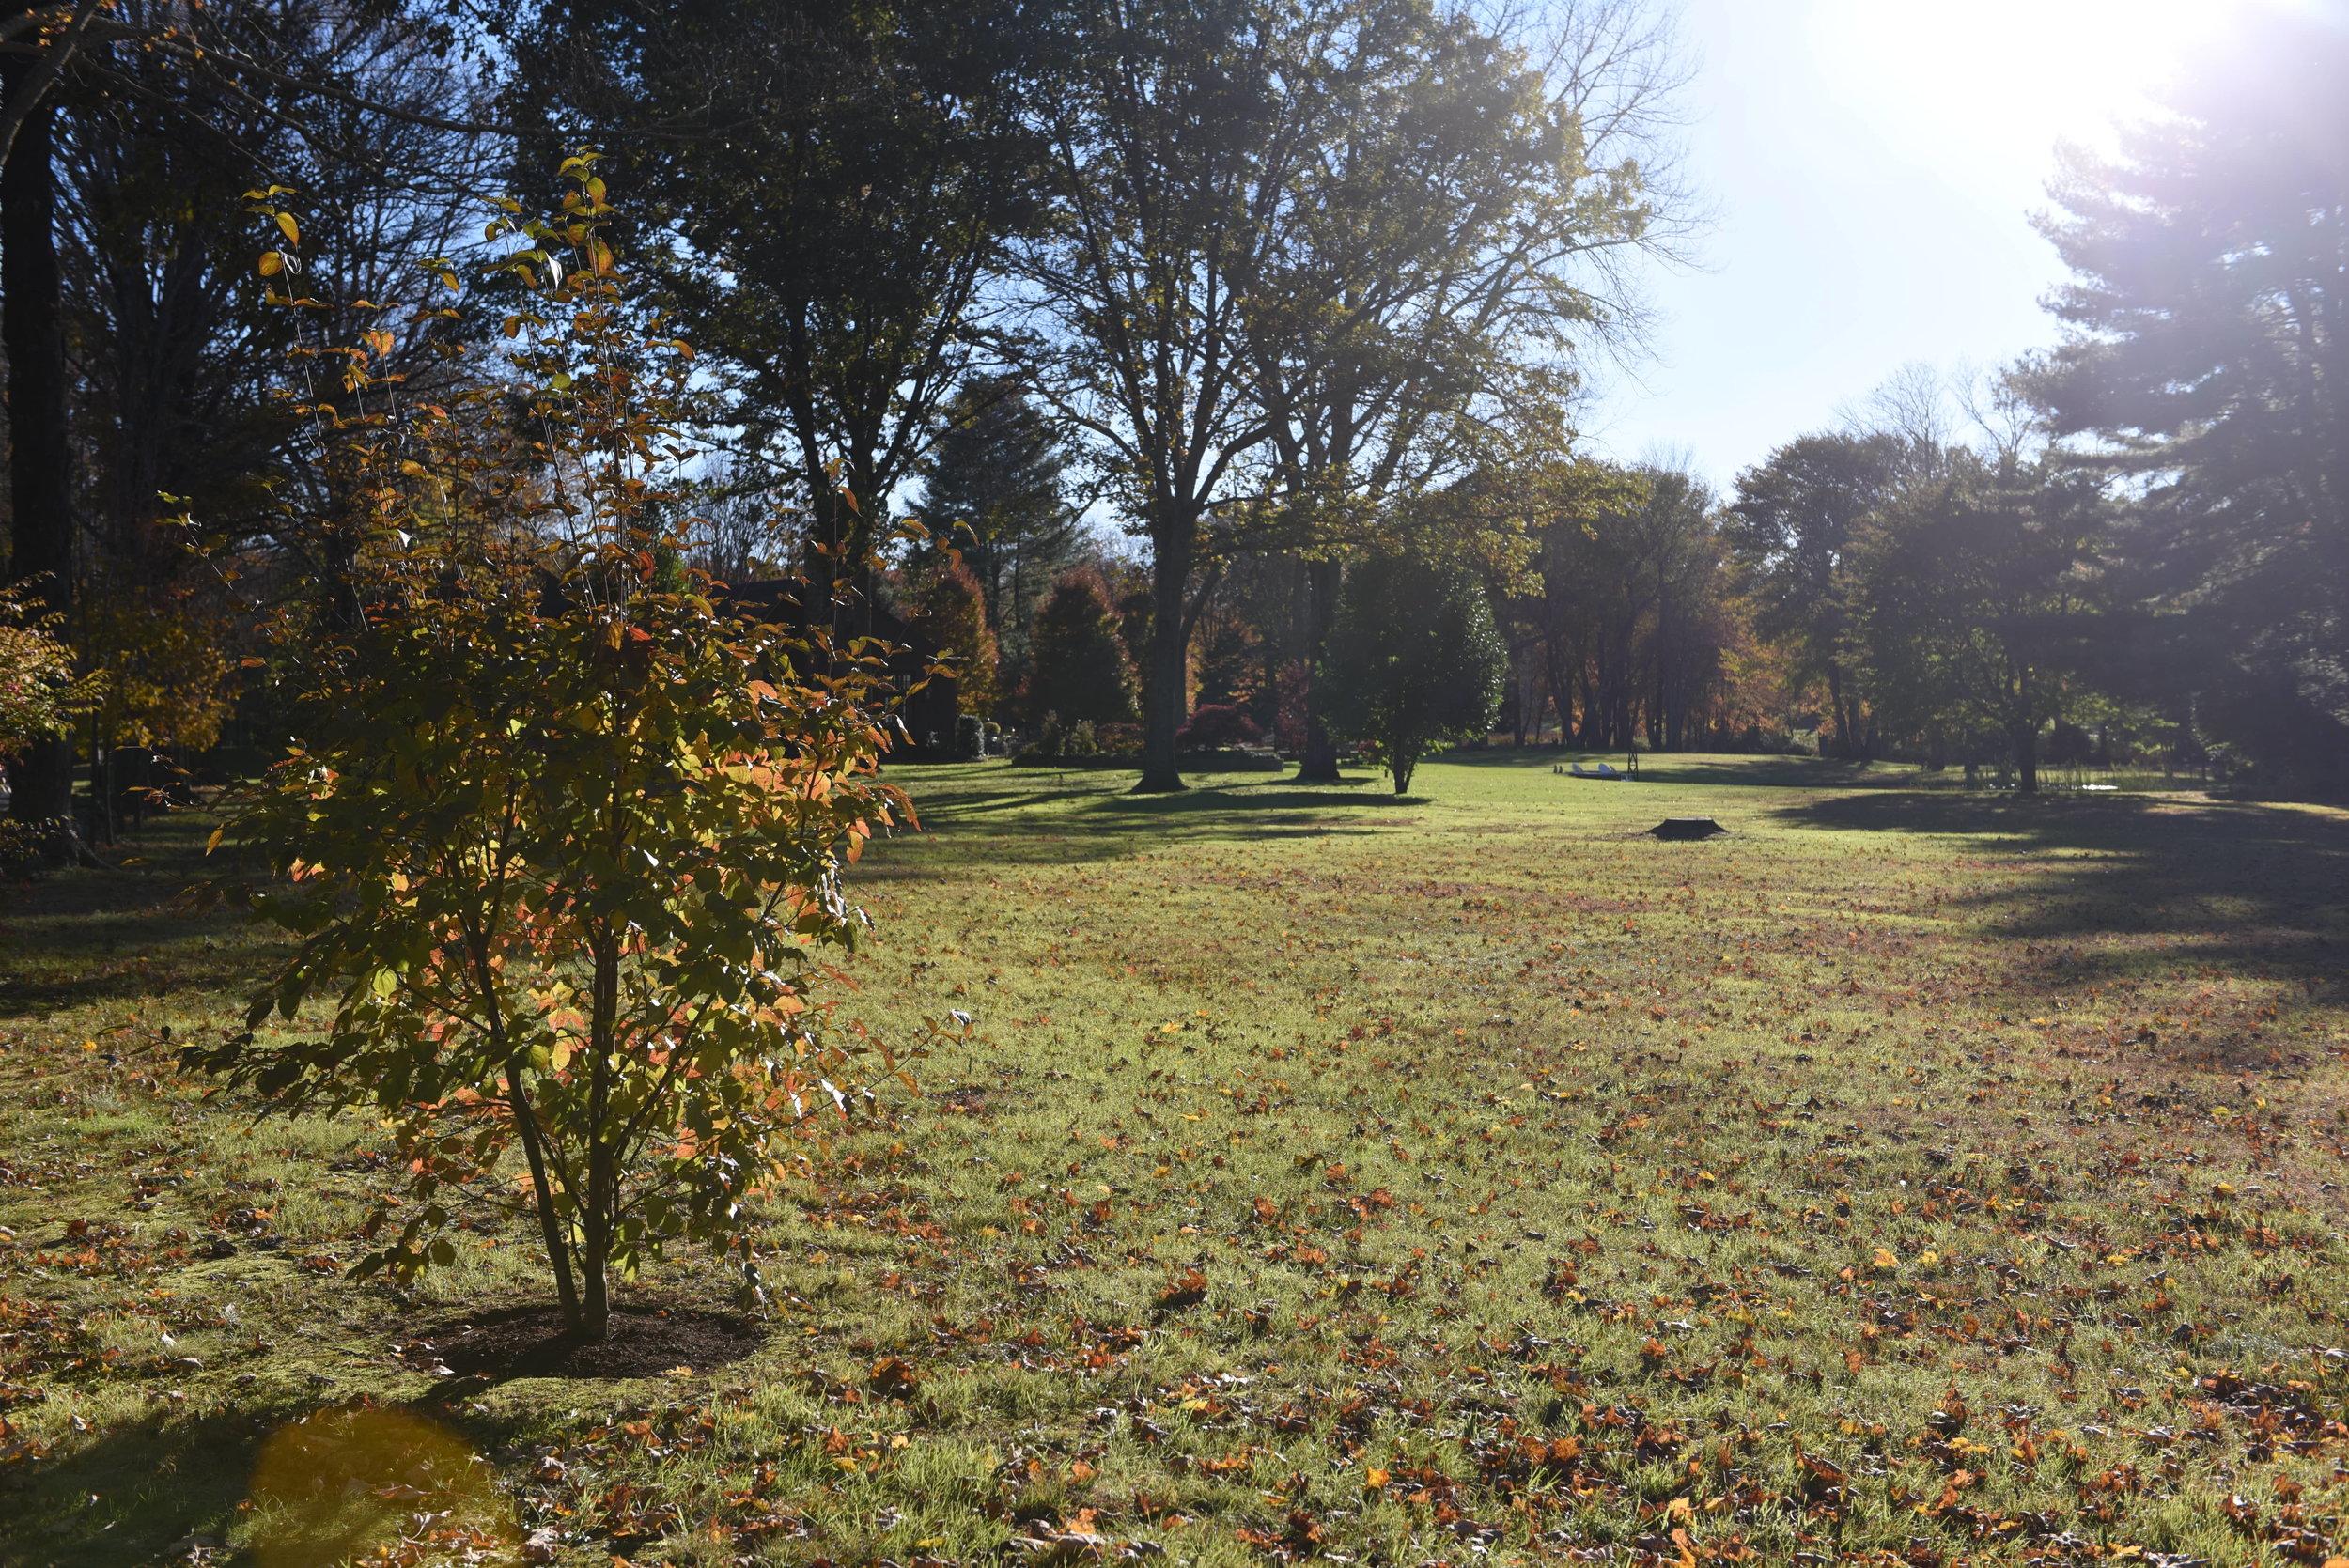 Fall-in-Connecticut.jpg